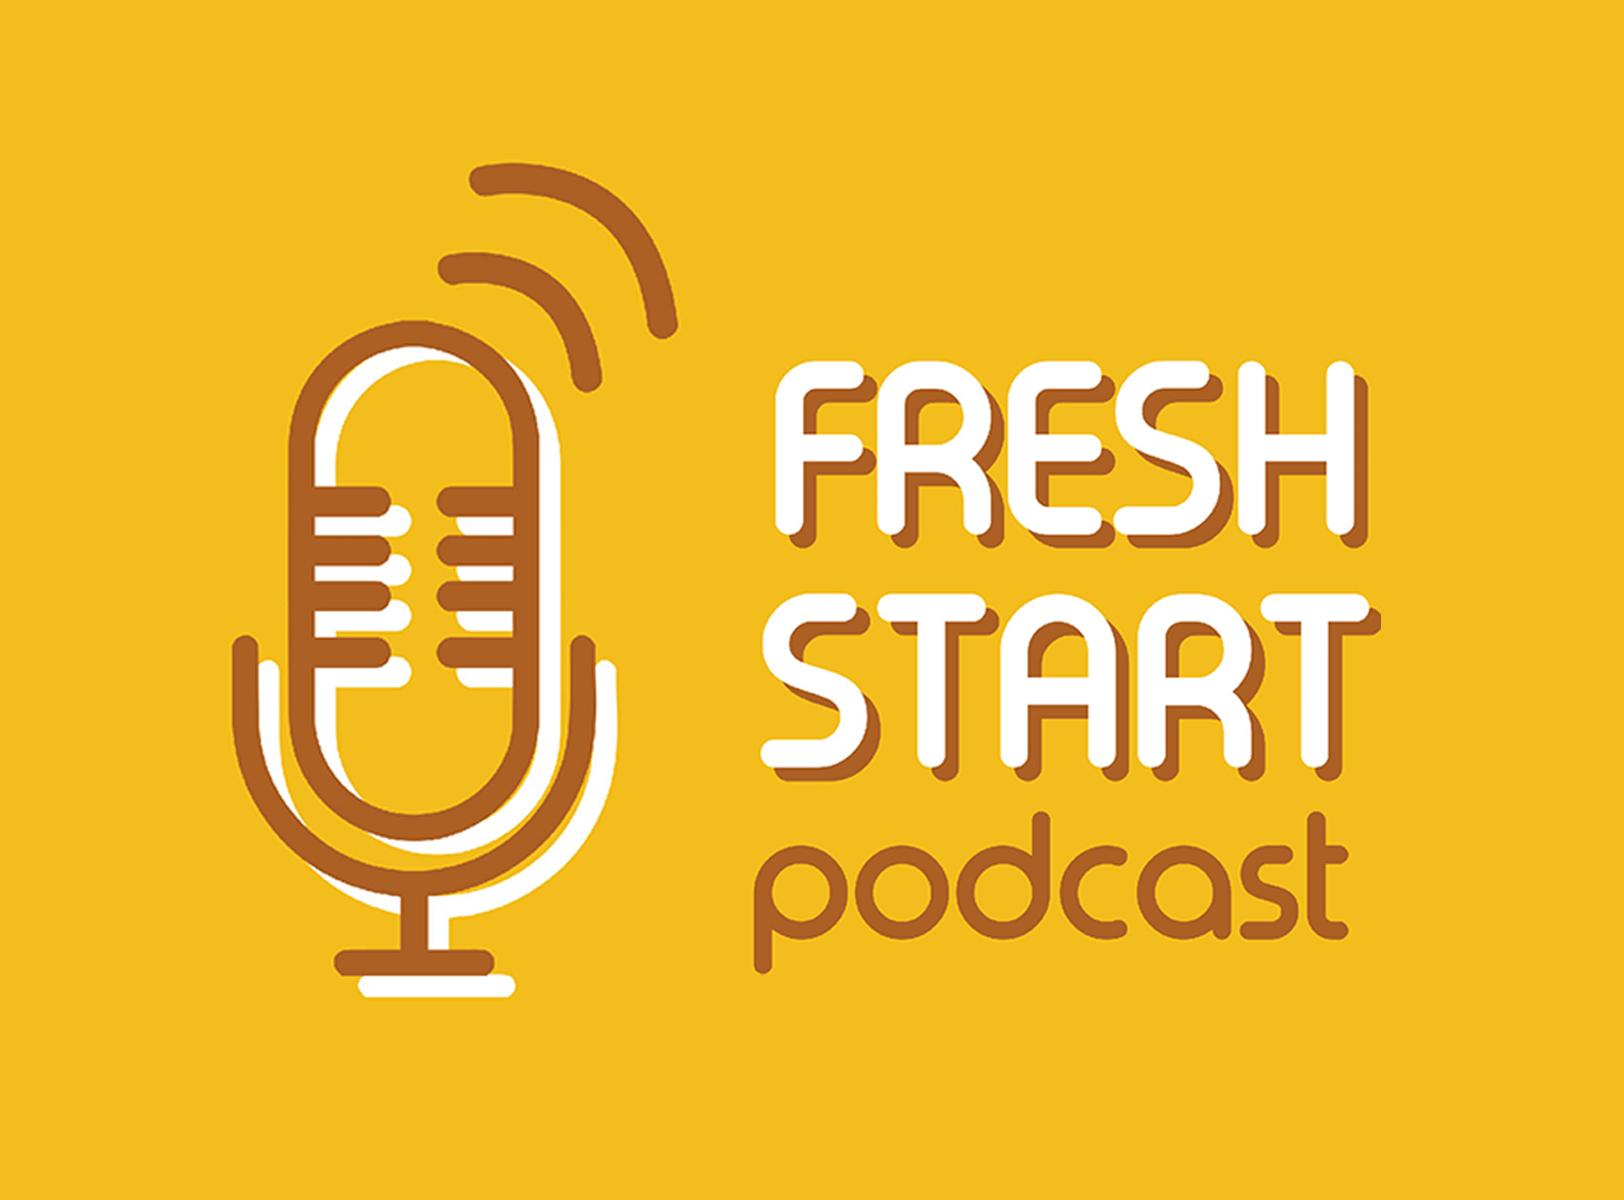 Fresh Start: Podcast News (5/4/2020 Mon.)